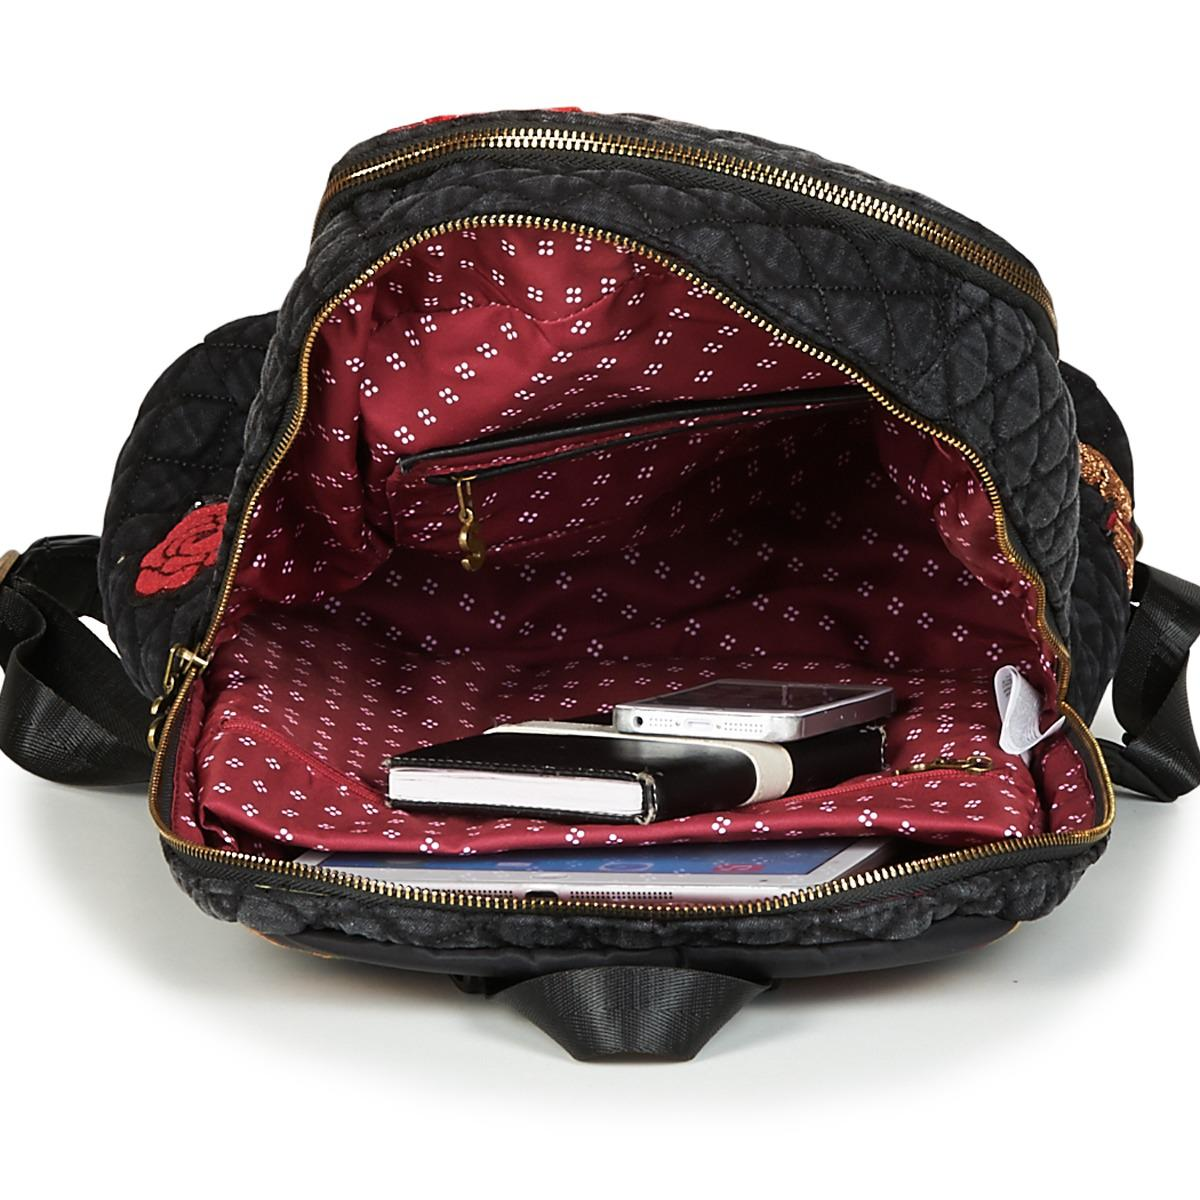 c9d29edbdfc6 Desigual Bols Always Milan Backpack in Black for Men - Lyst